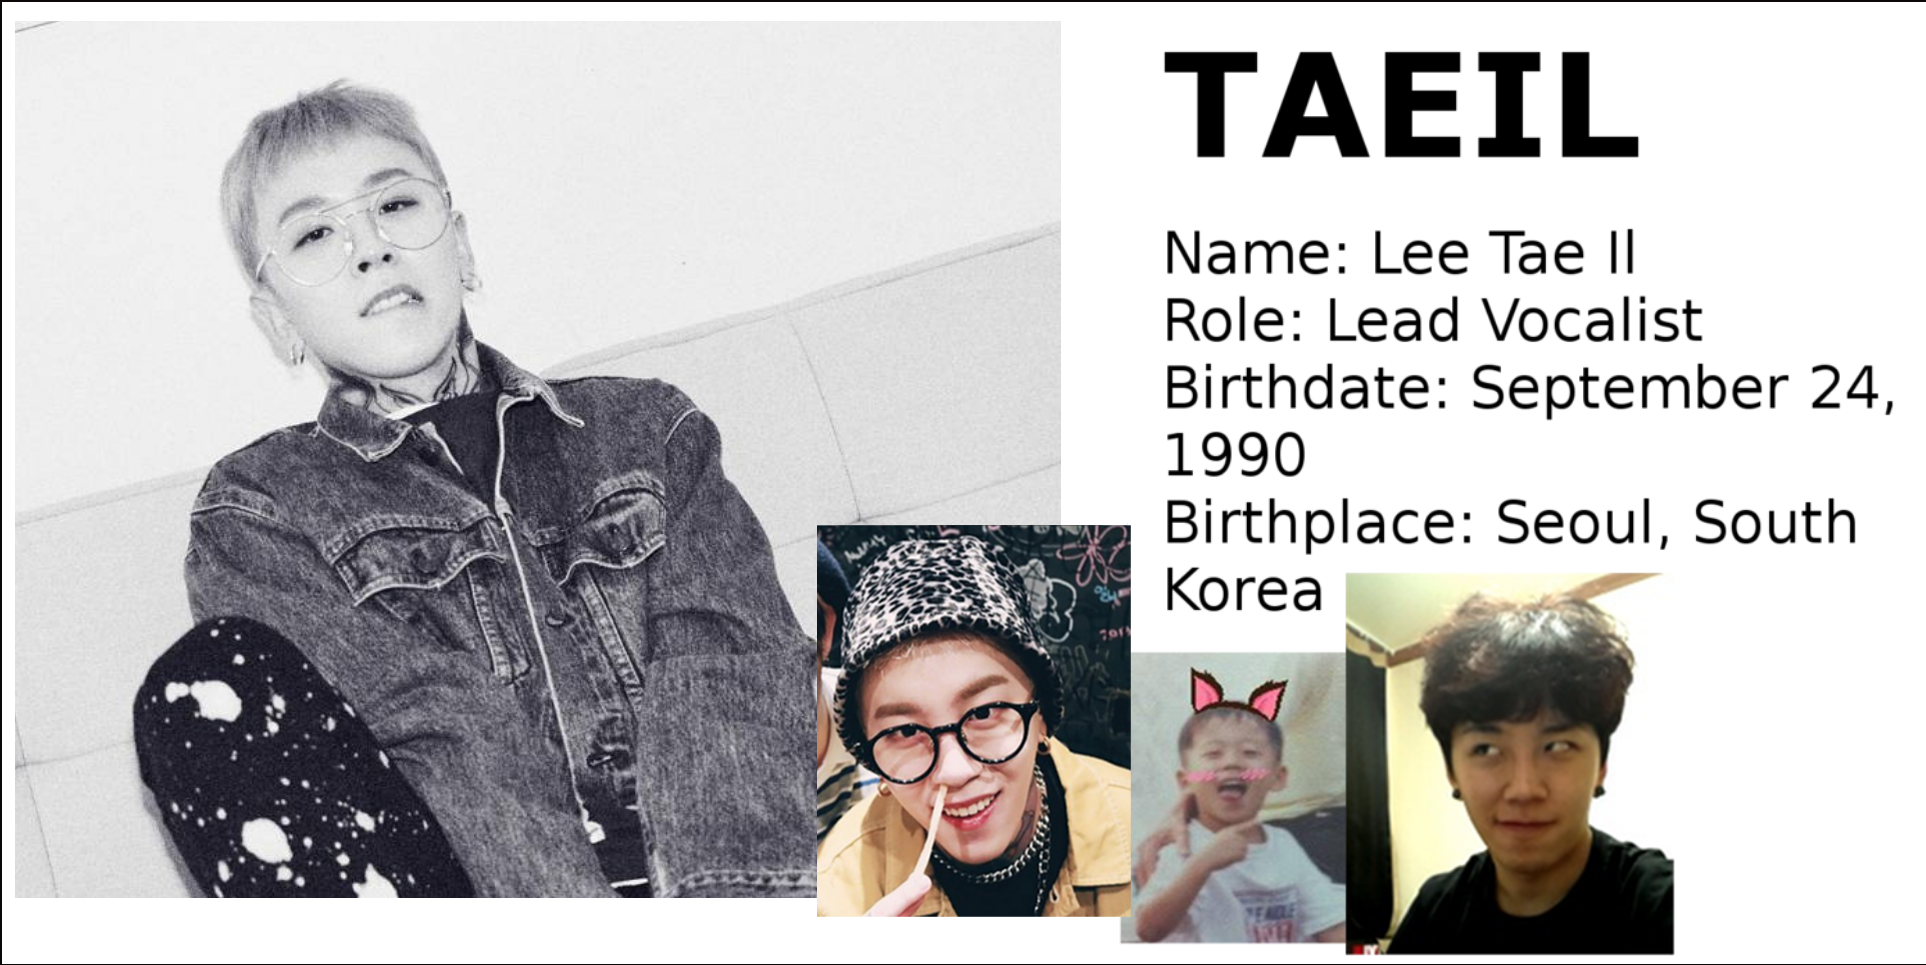 Taeil Block B singer Korean songs profile Block B: Zico, Park Kyung, Jaehyo, P.O, B-Bomb, U-Kwon, Taeil rapper songs Korean K-pop K hip hop hep hap Bastarz profile mitglieder membres member tattoo personalities personality maknae age oldest youngest T2U